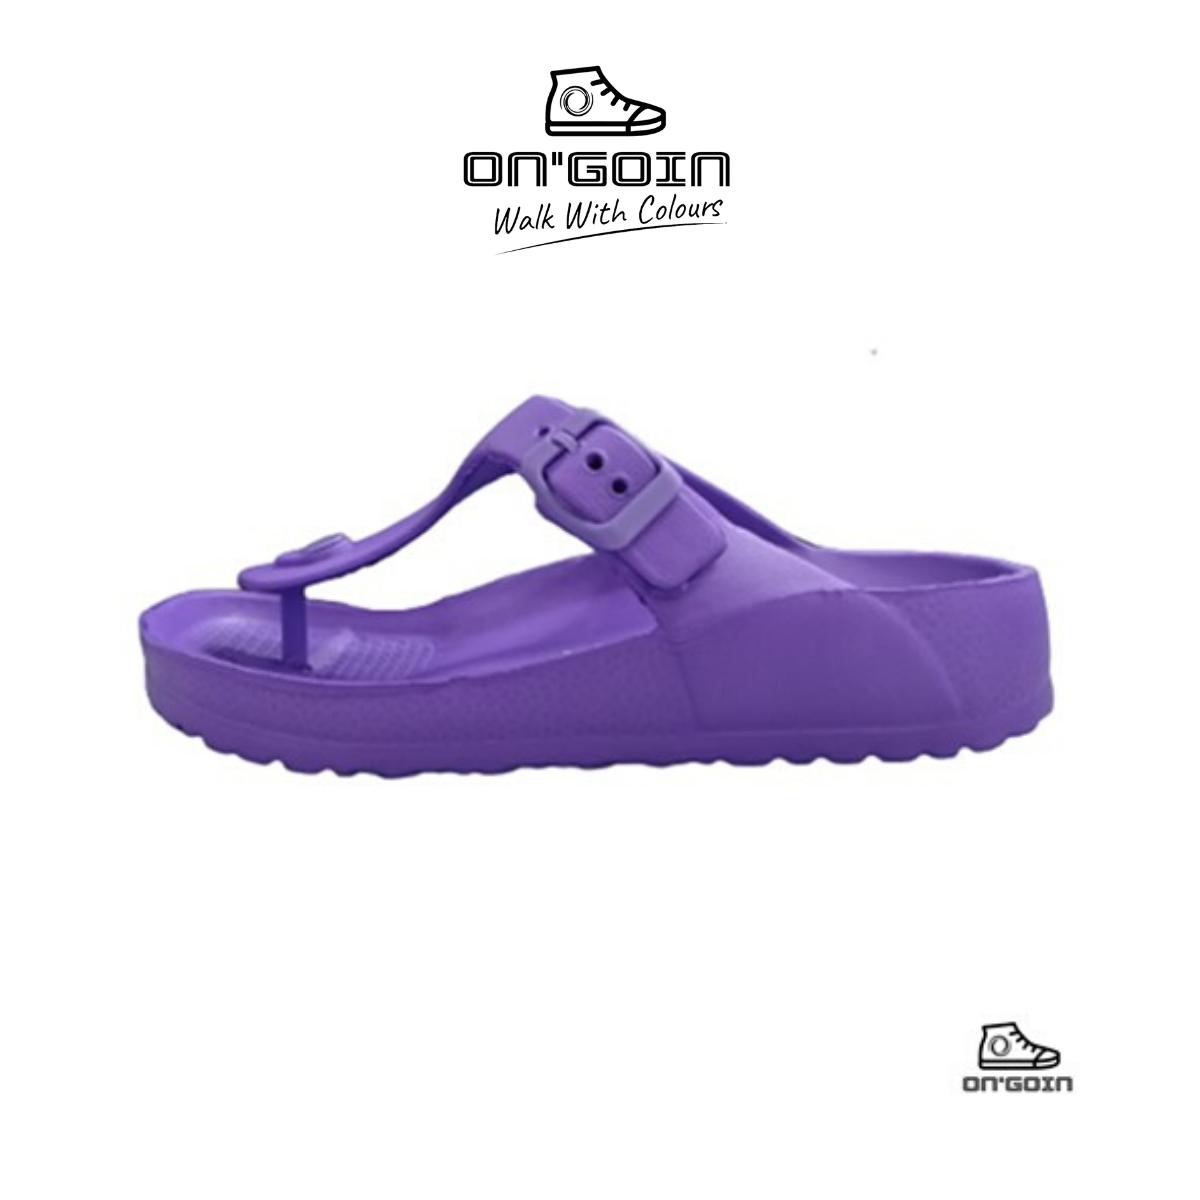 "On""Goin Classic-T Kids Sandals Size EU 26-30"